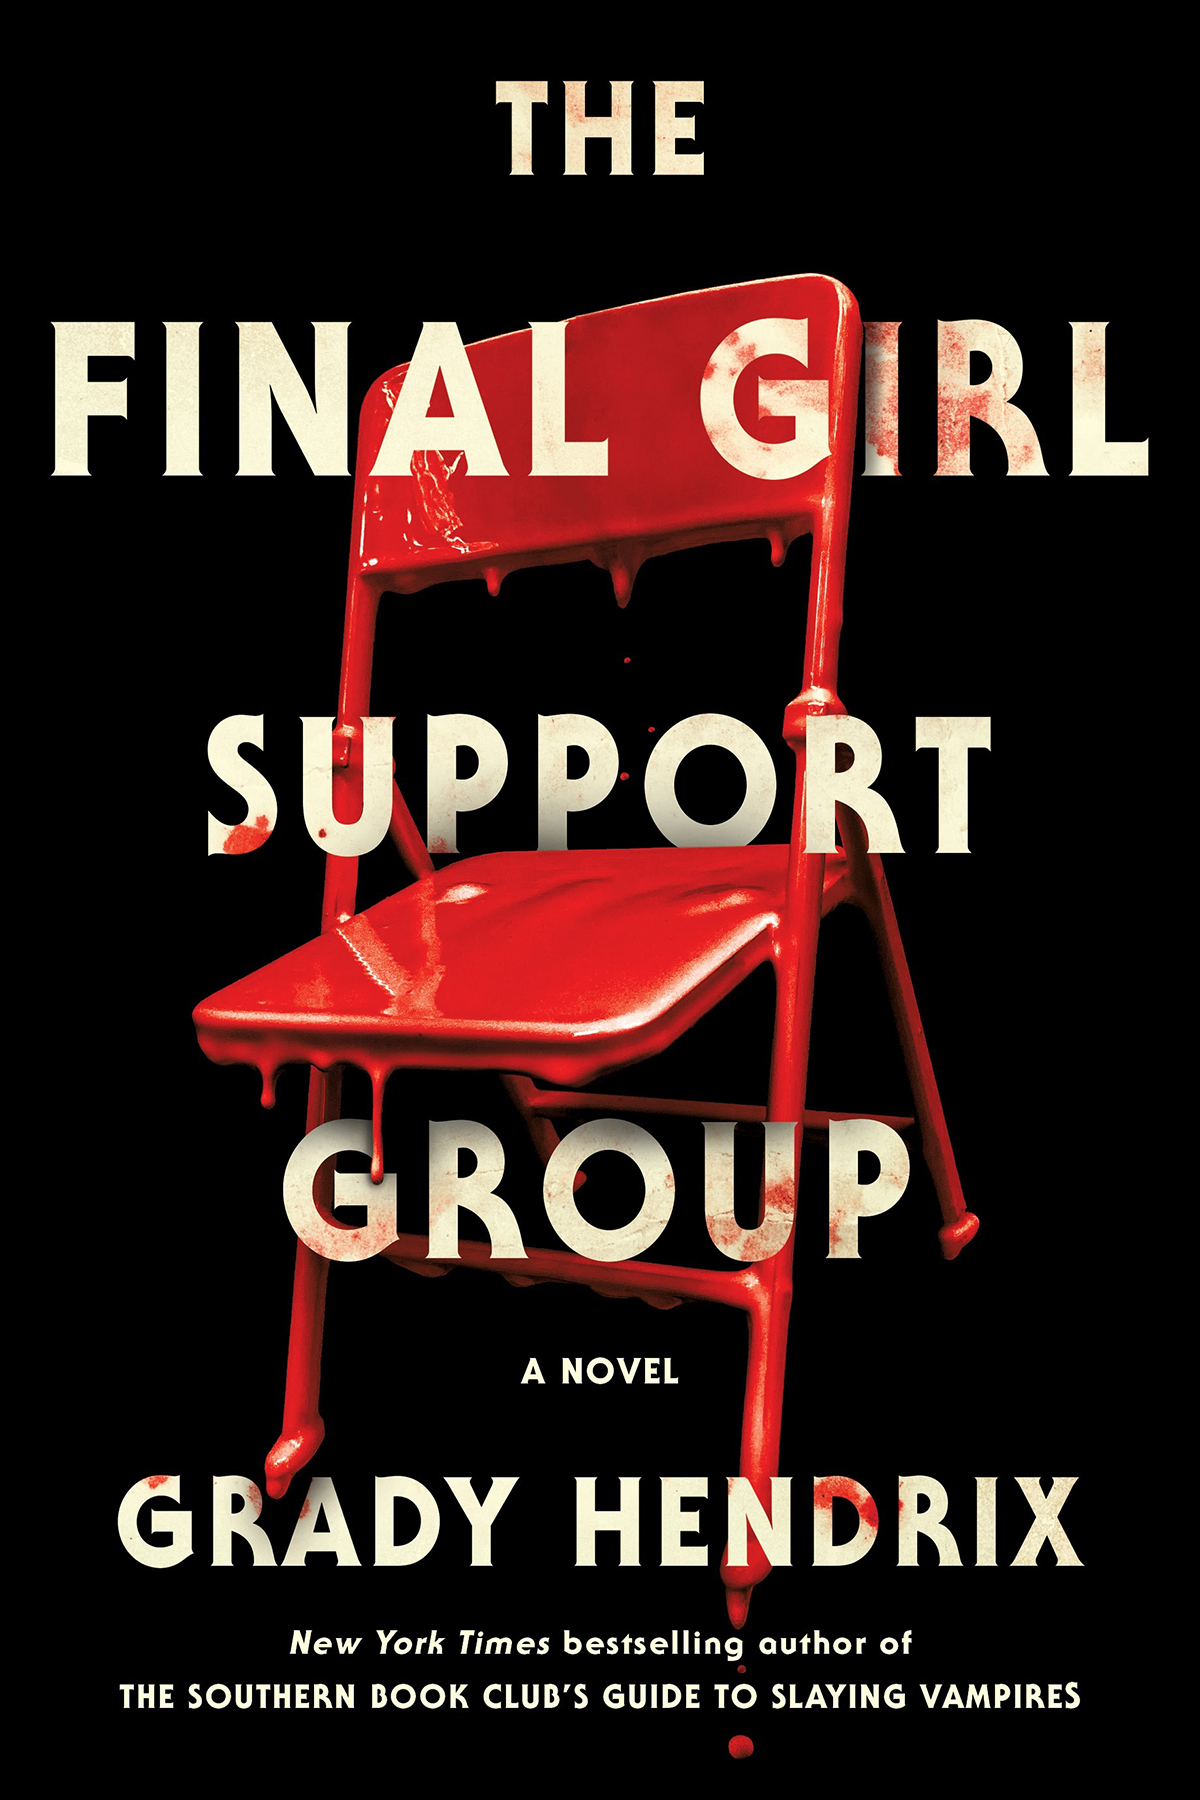 final girl support group slasher films